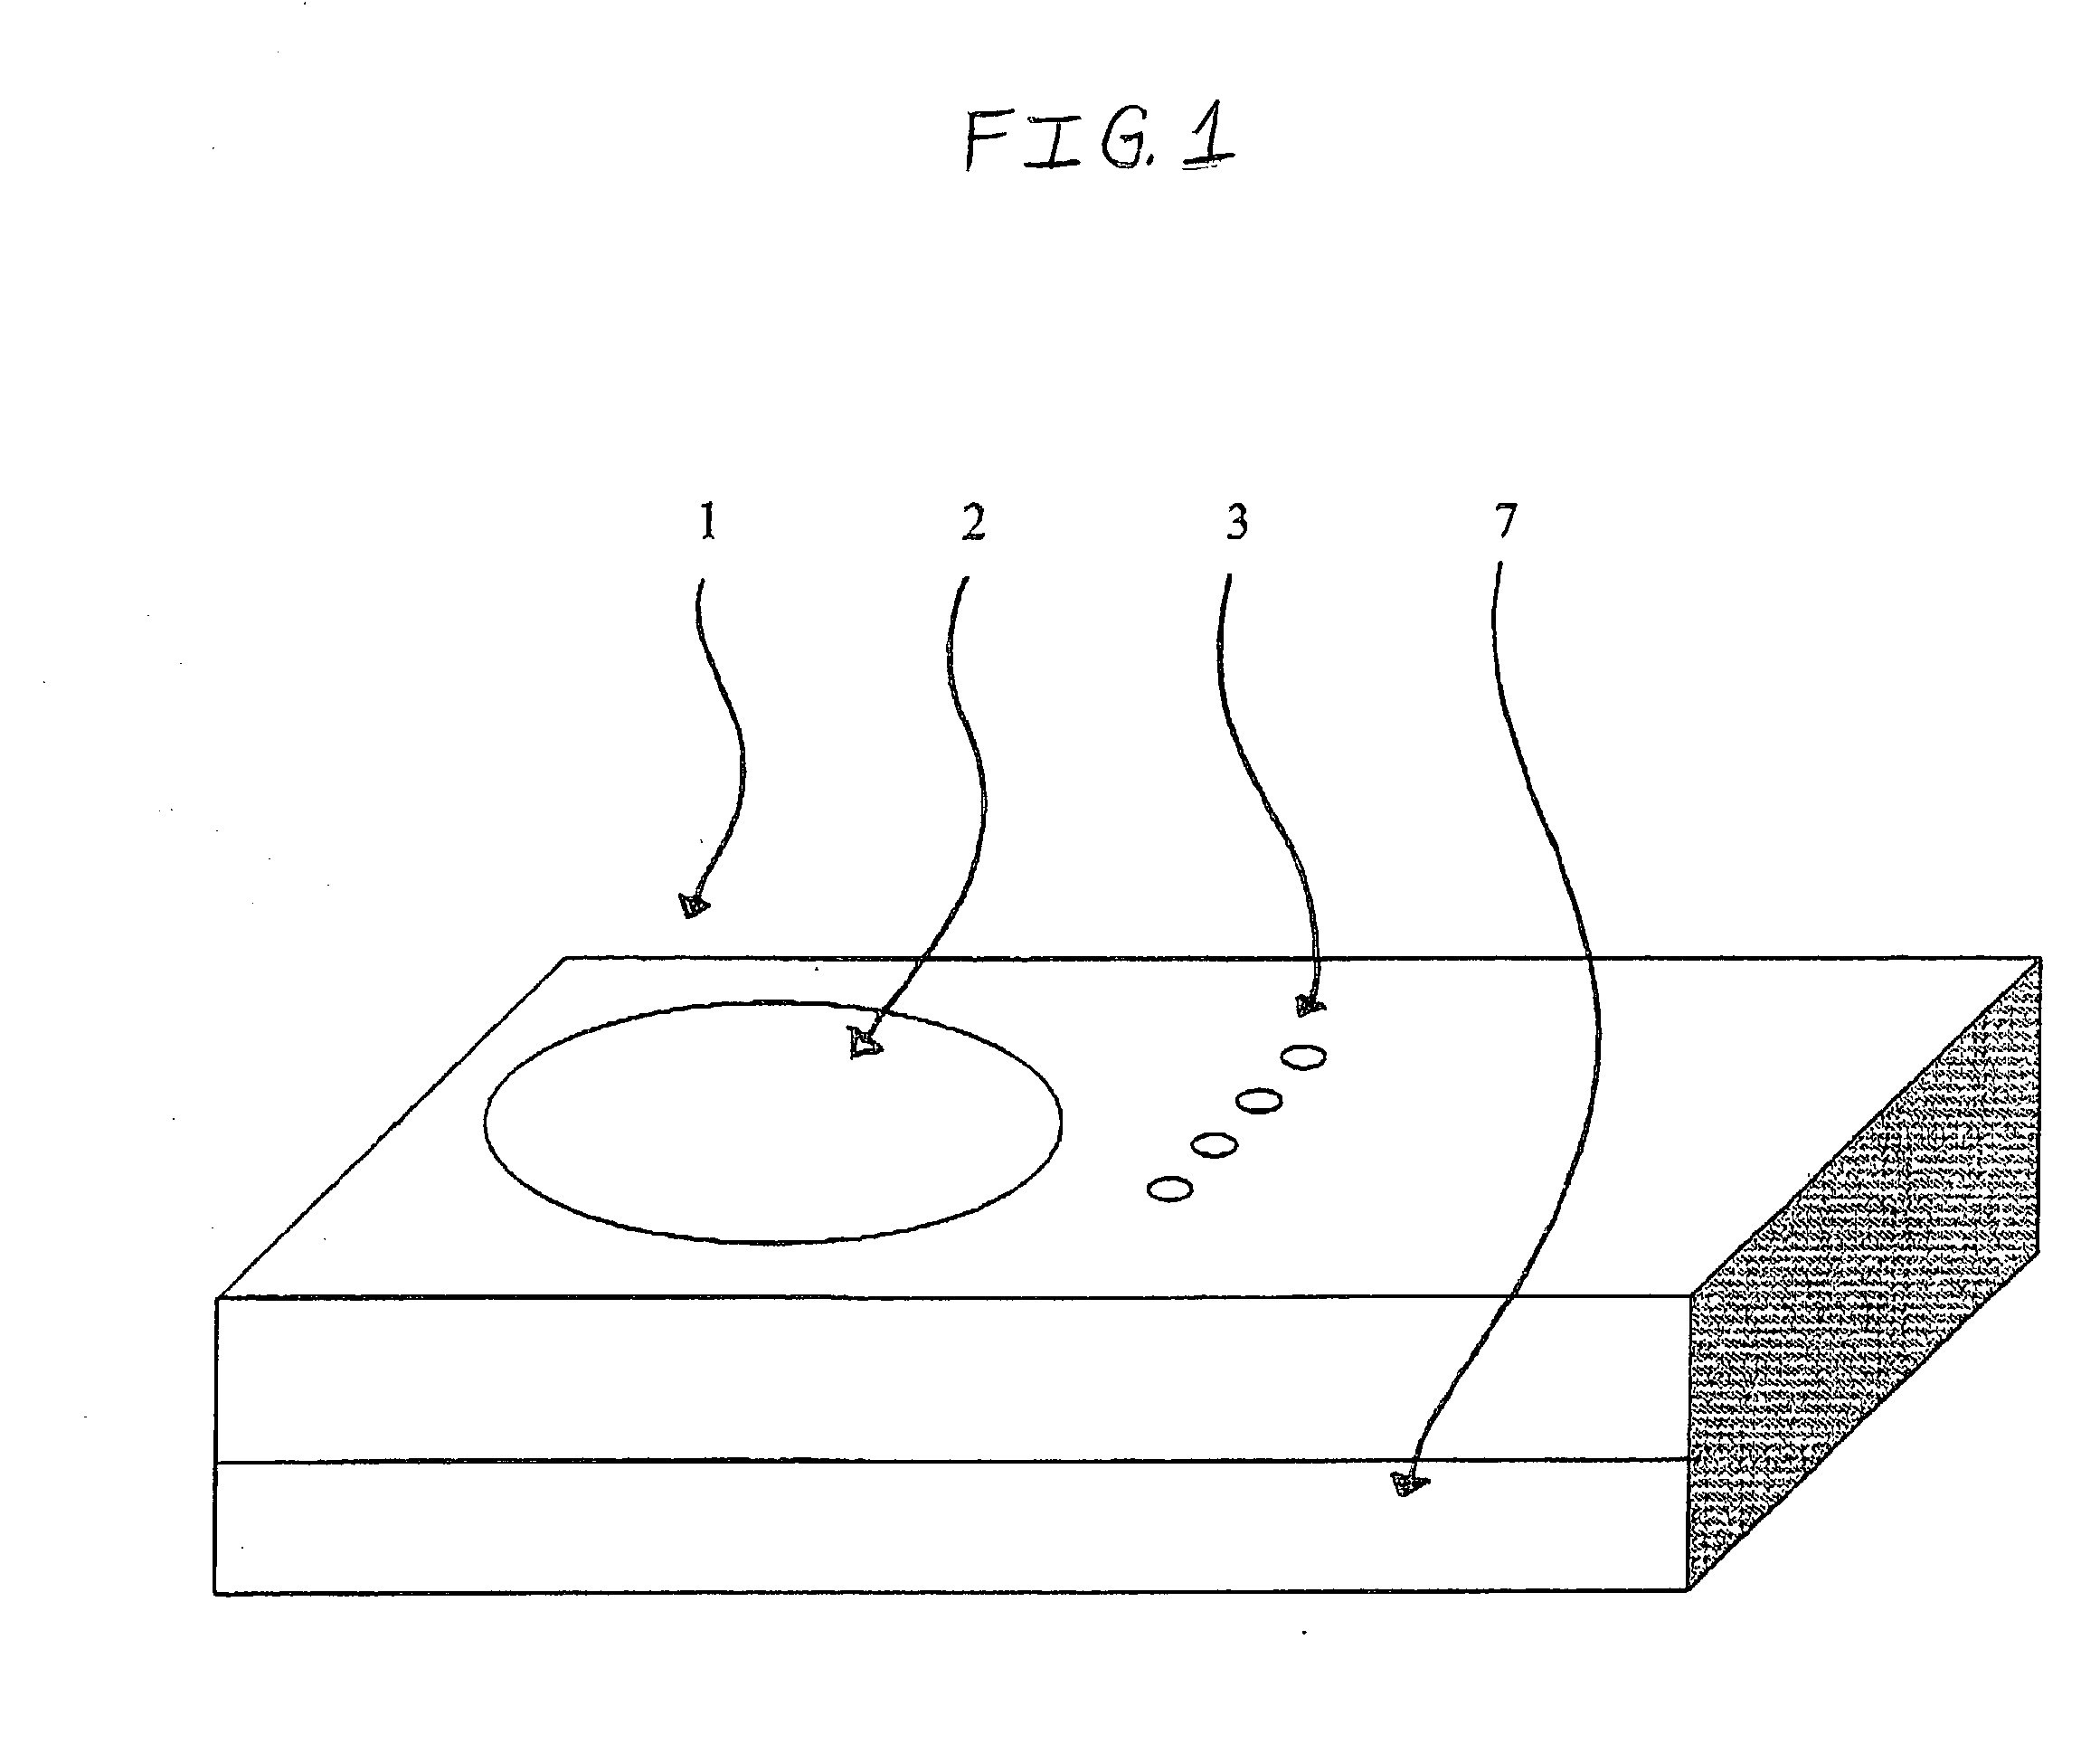 Patent Us20040220686 Electronic Training Aide Google Patents Wood Pecker Sound Generator Circuit Diagram Image Drawing